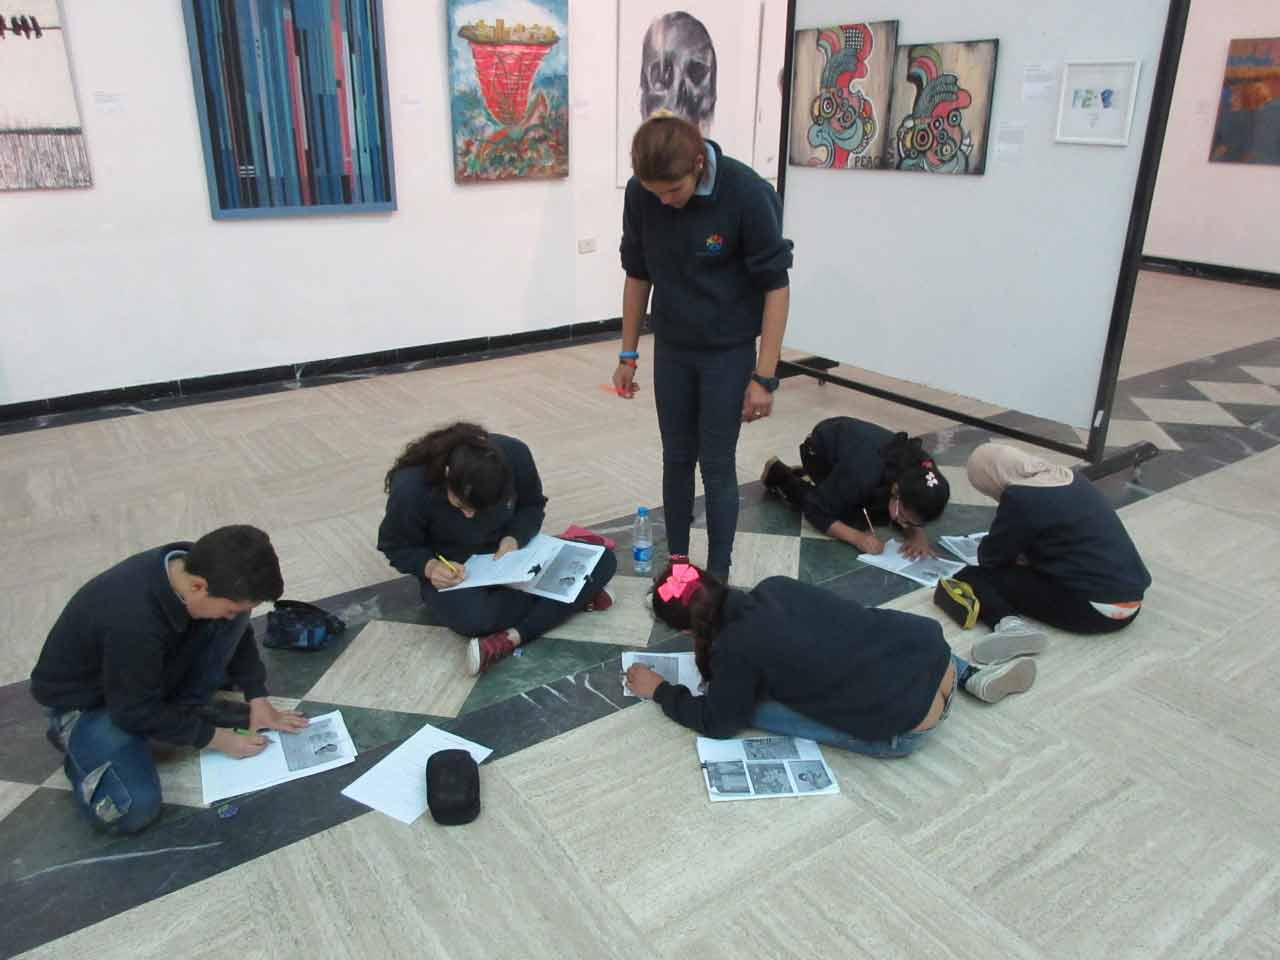 31.-Students-of-School-X-at-SOS-Art-Liban-writing-answers..